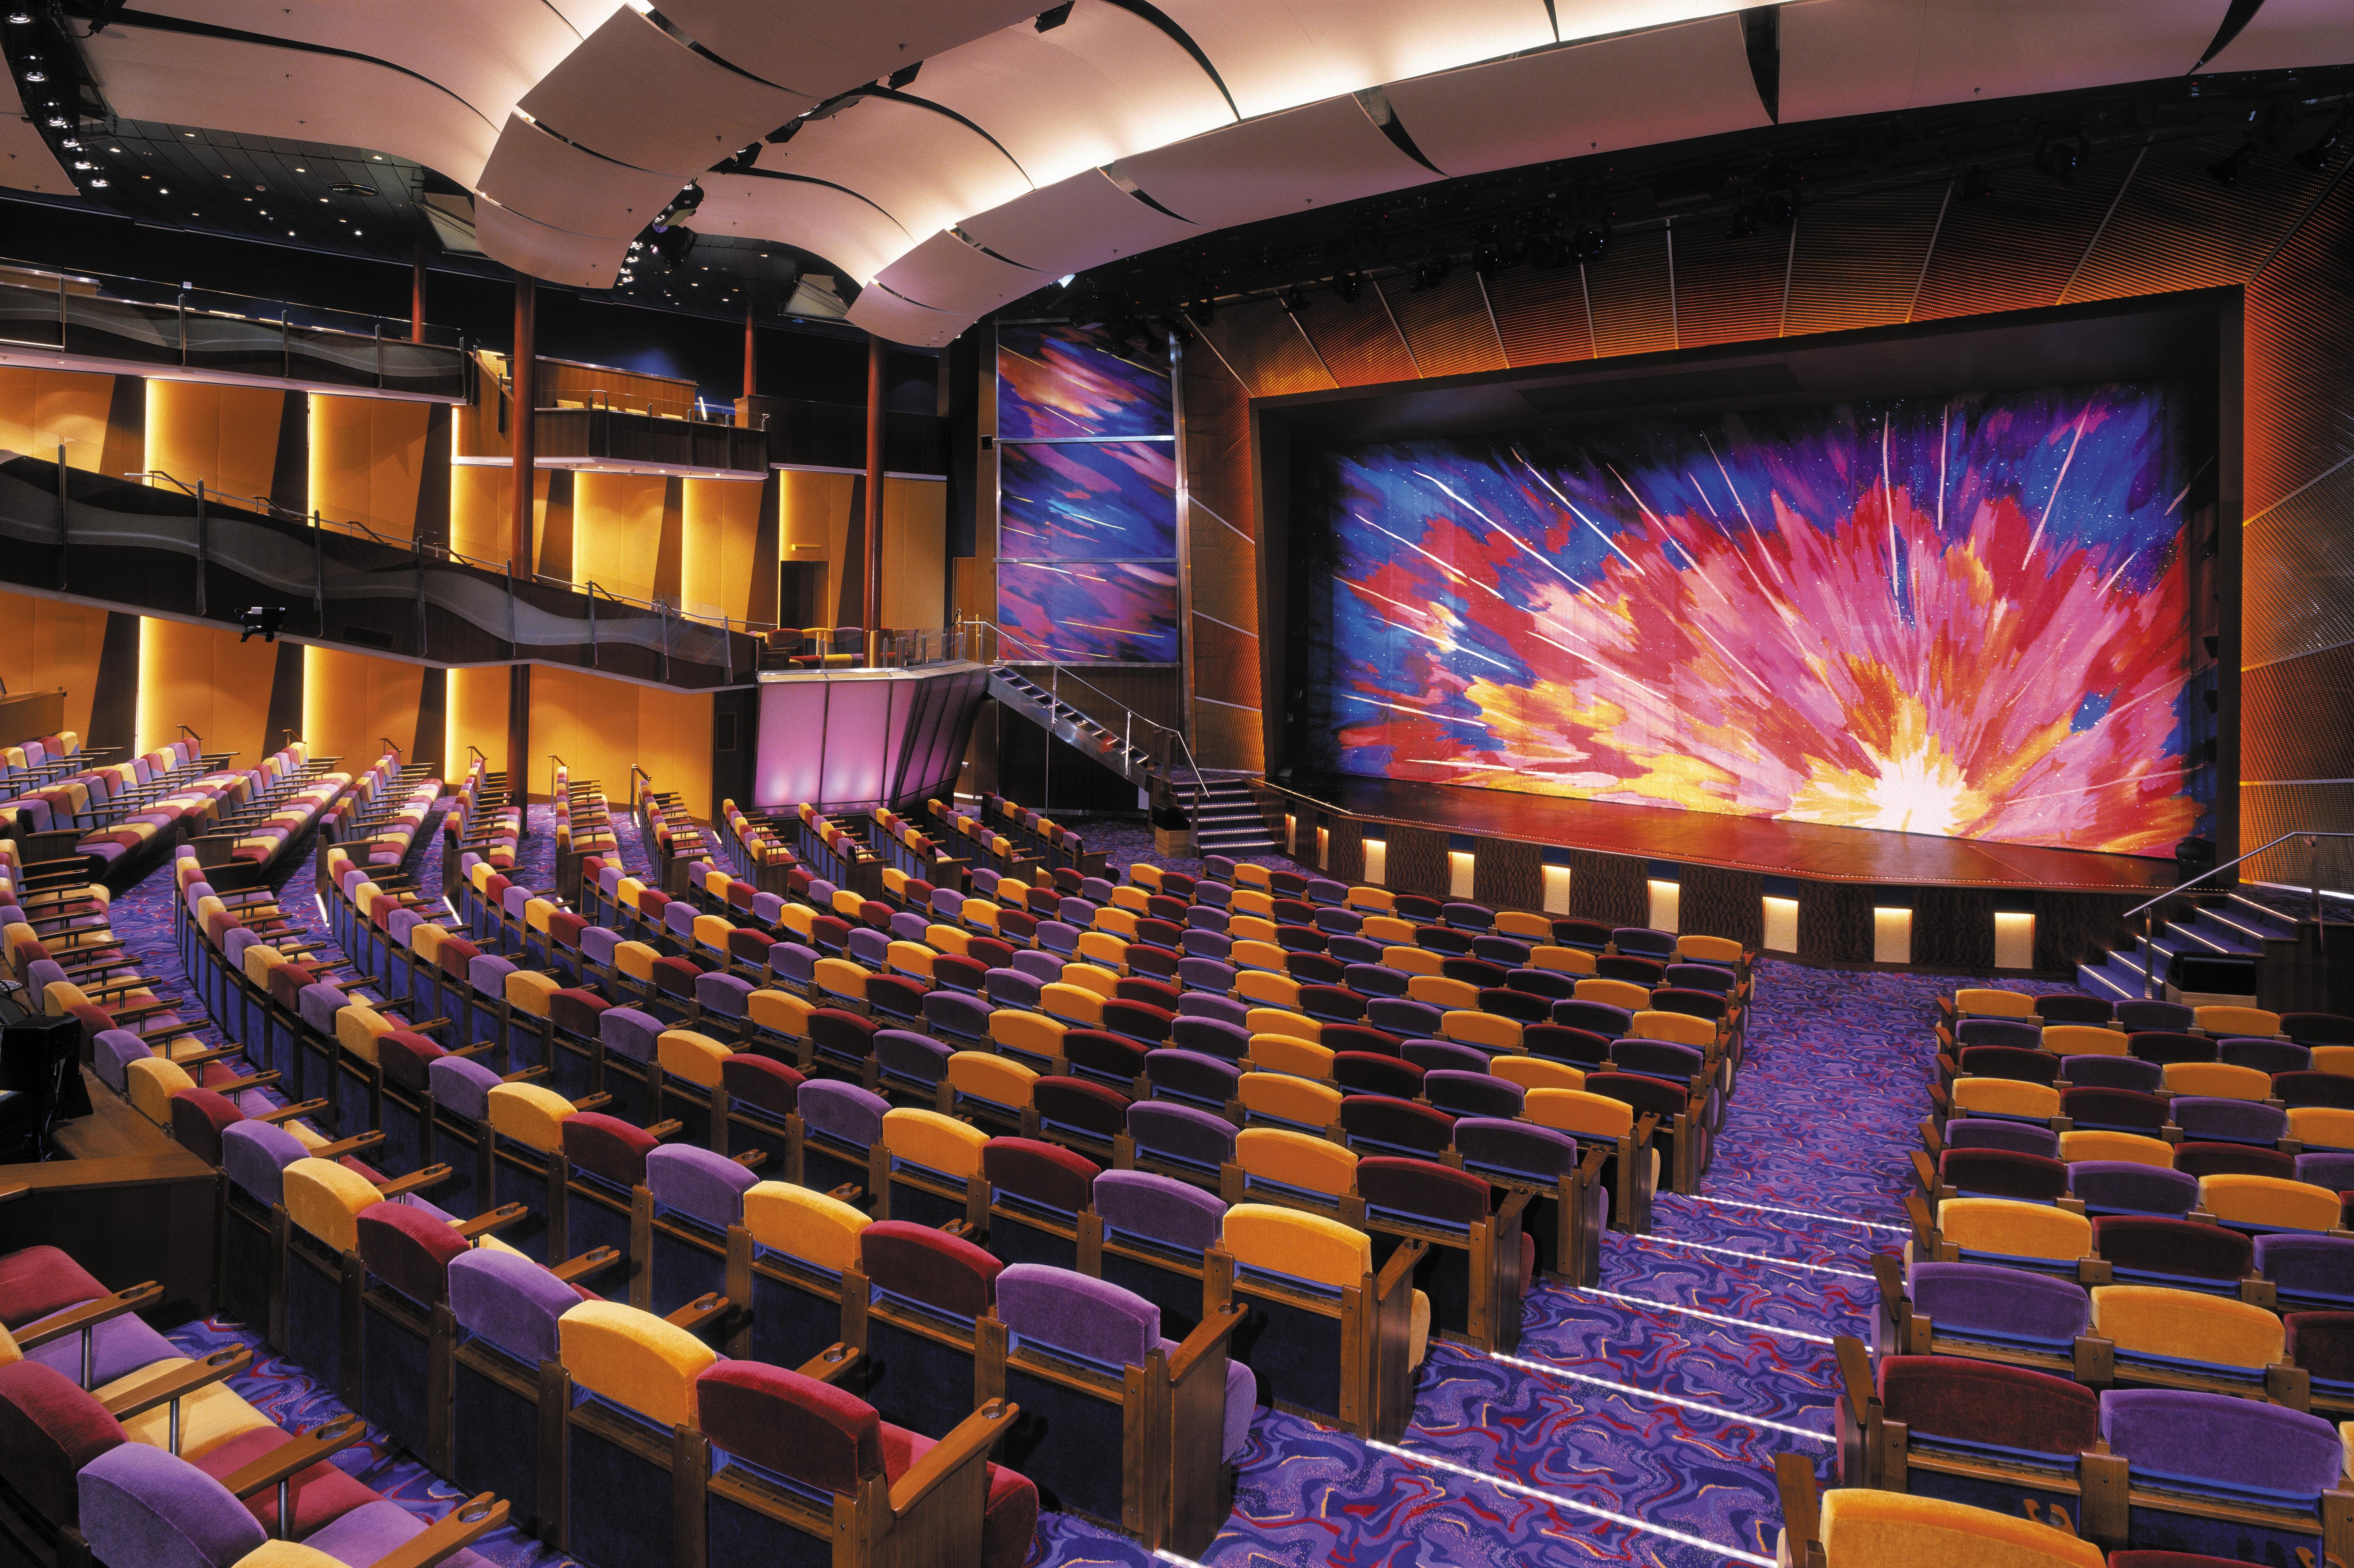 Royal Caribbean International Brilliance of the Seas Interior Pacifica Theater.jpg